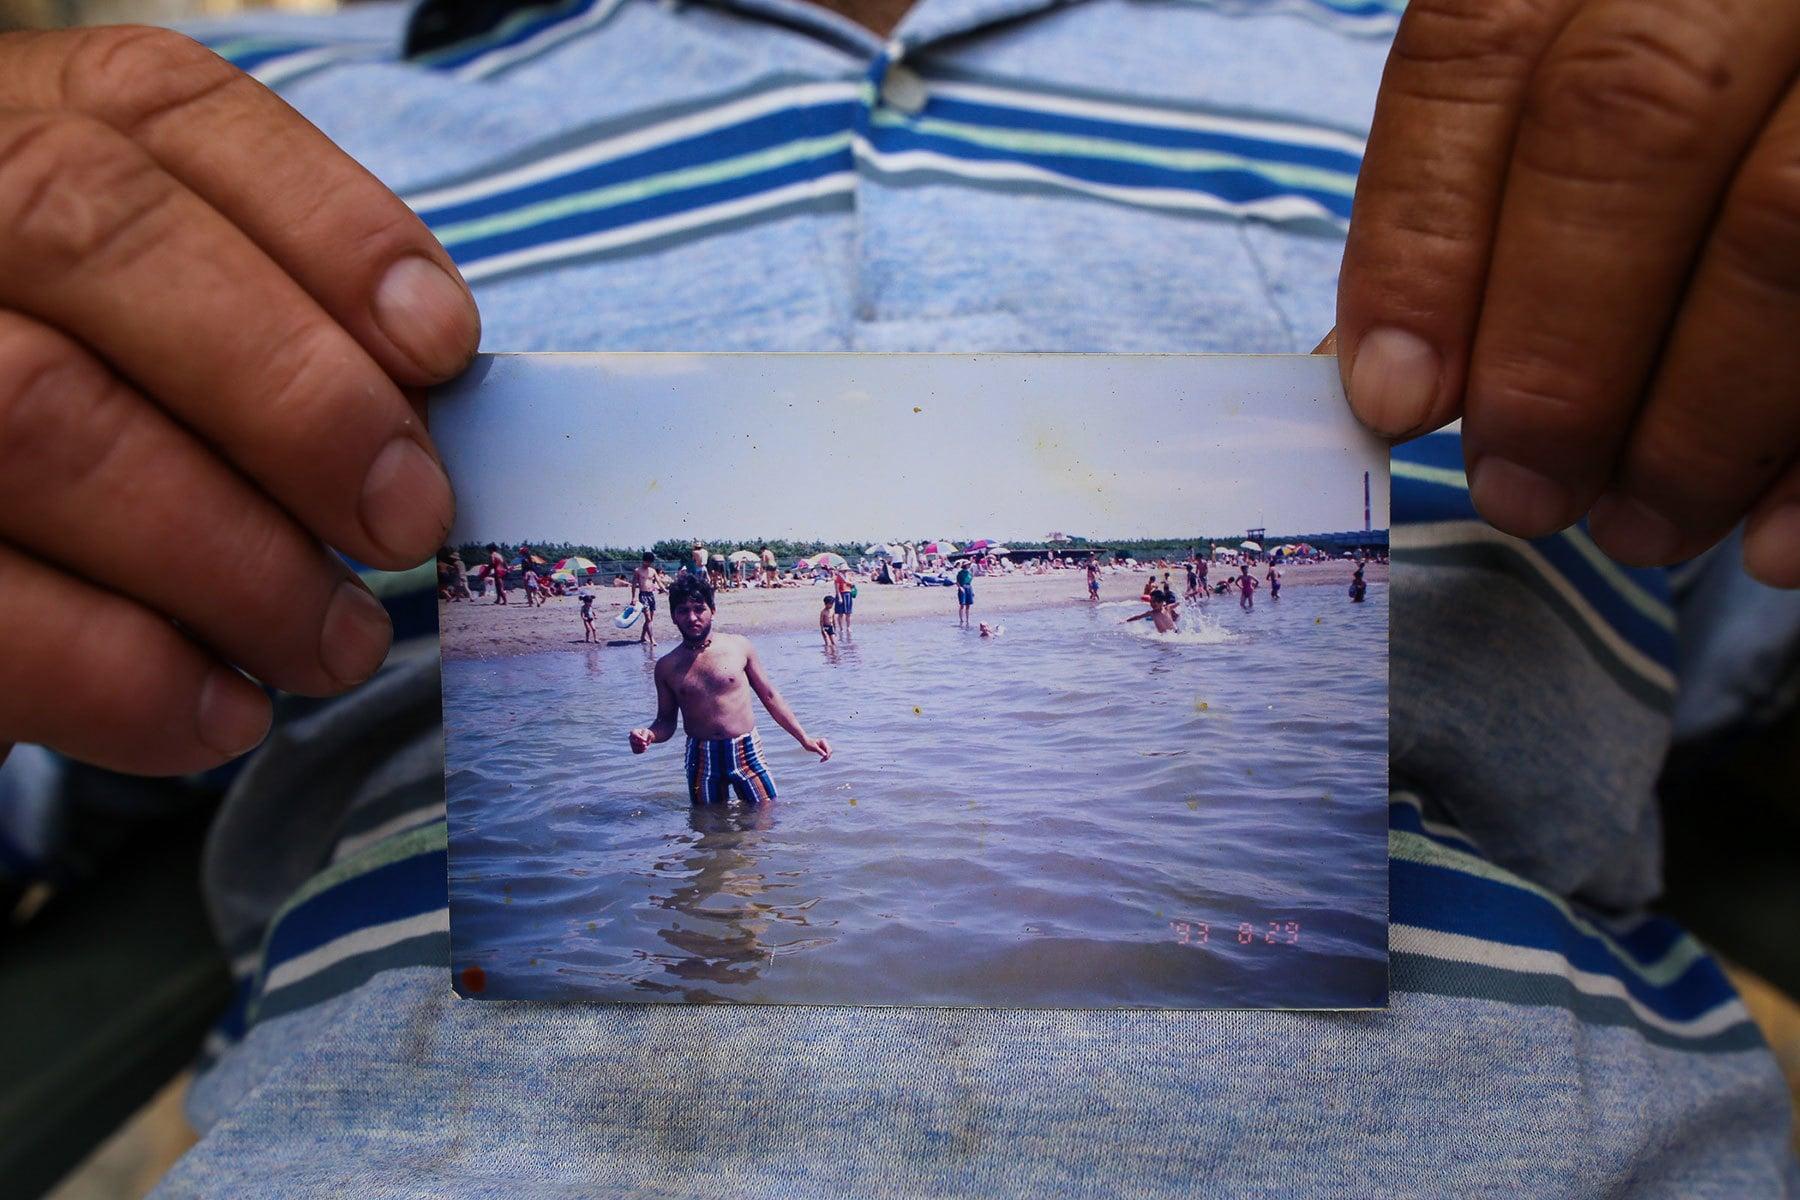 Miraj enjoys the summer at the Chibu beach in Tokyo,Japan.